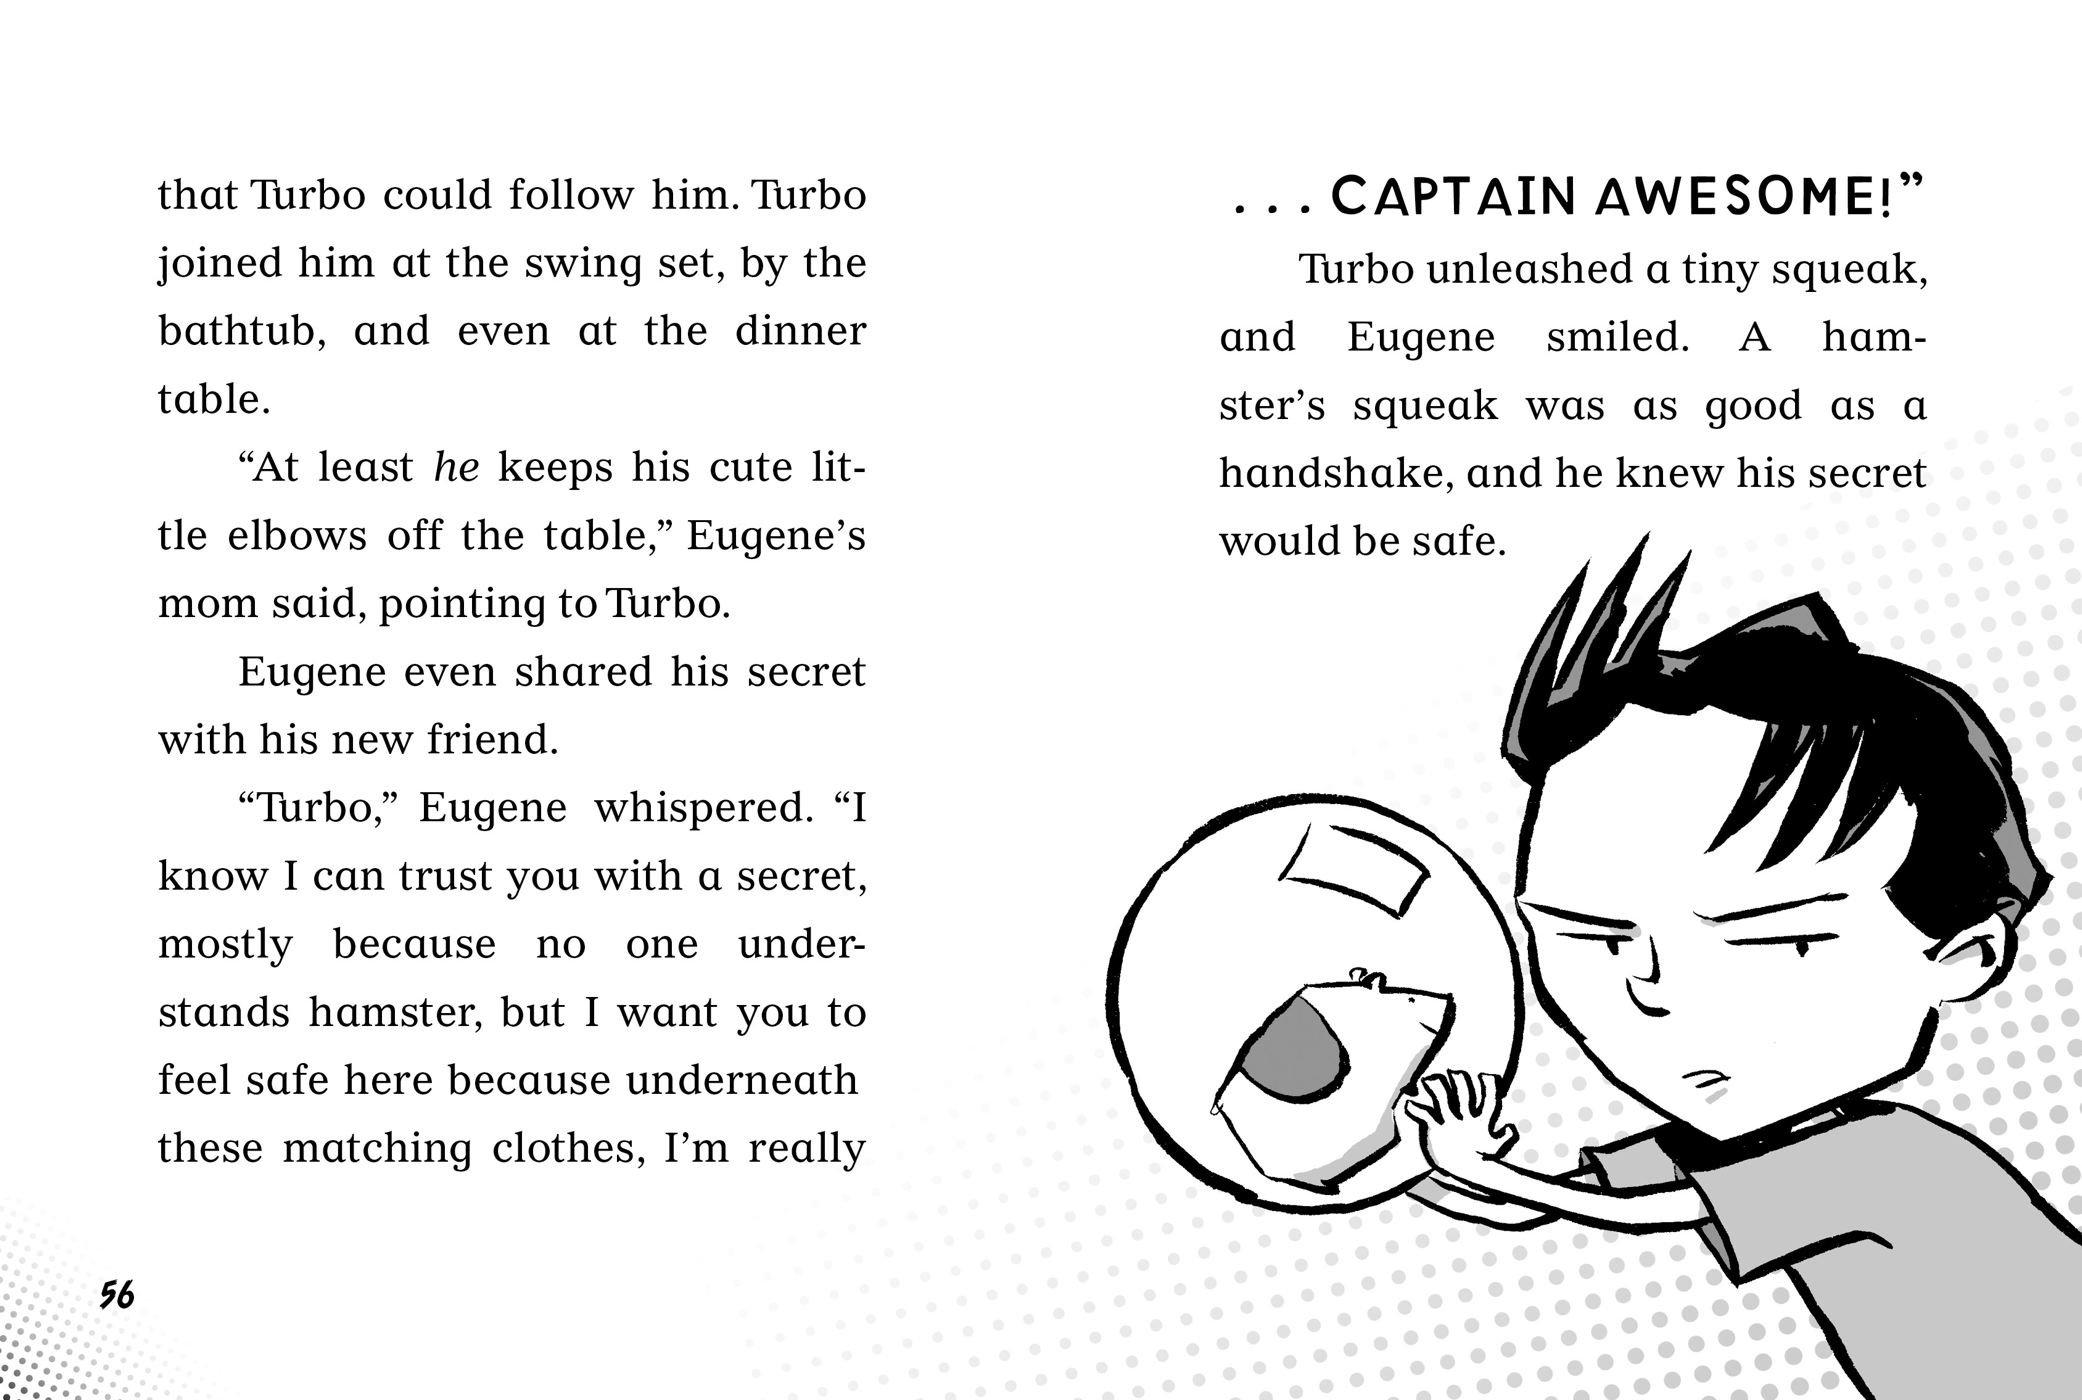 Captain Awesome to the Rescue!: Amazon.es: Stan Kirby, George OConnor: Libros en idiomas extranjeros